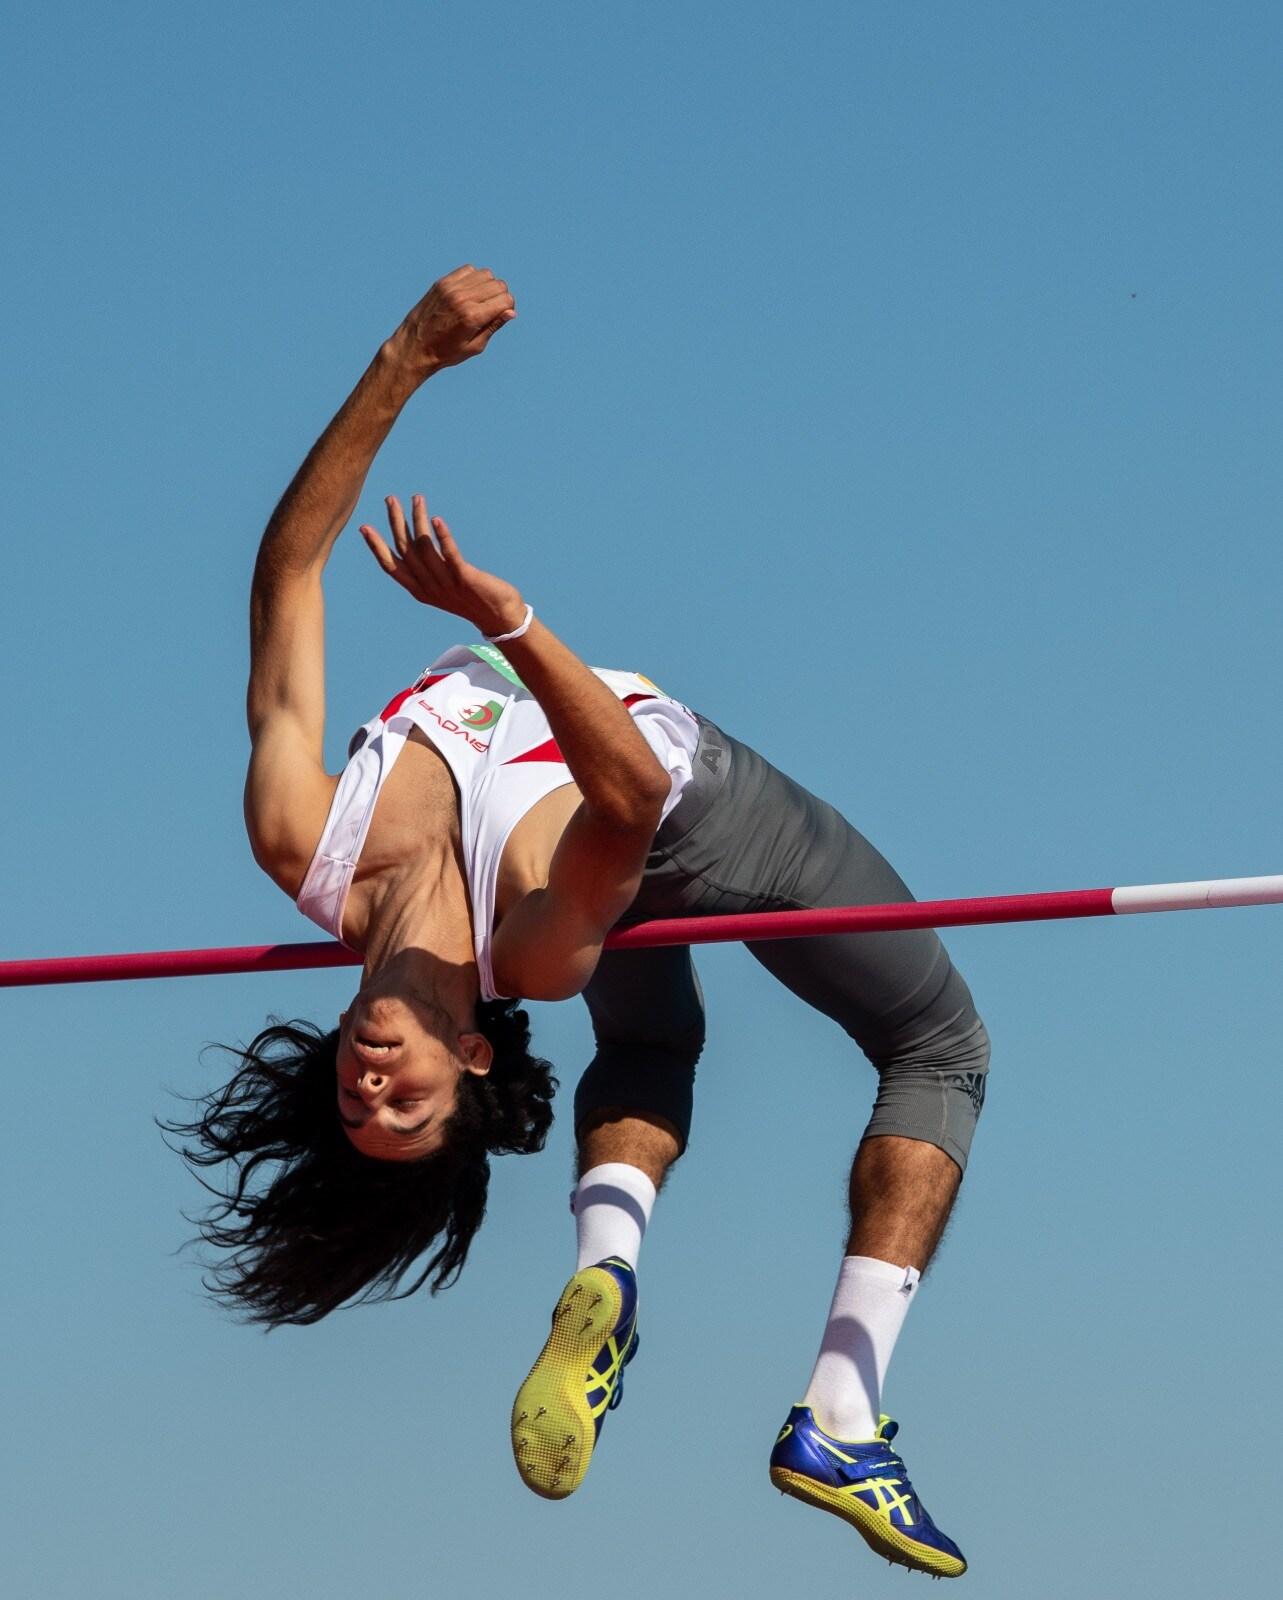 Buenos Aires 2018 - Athletics - Men's High Jump